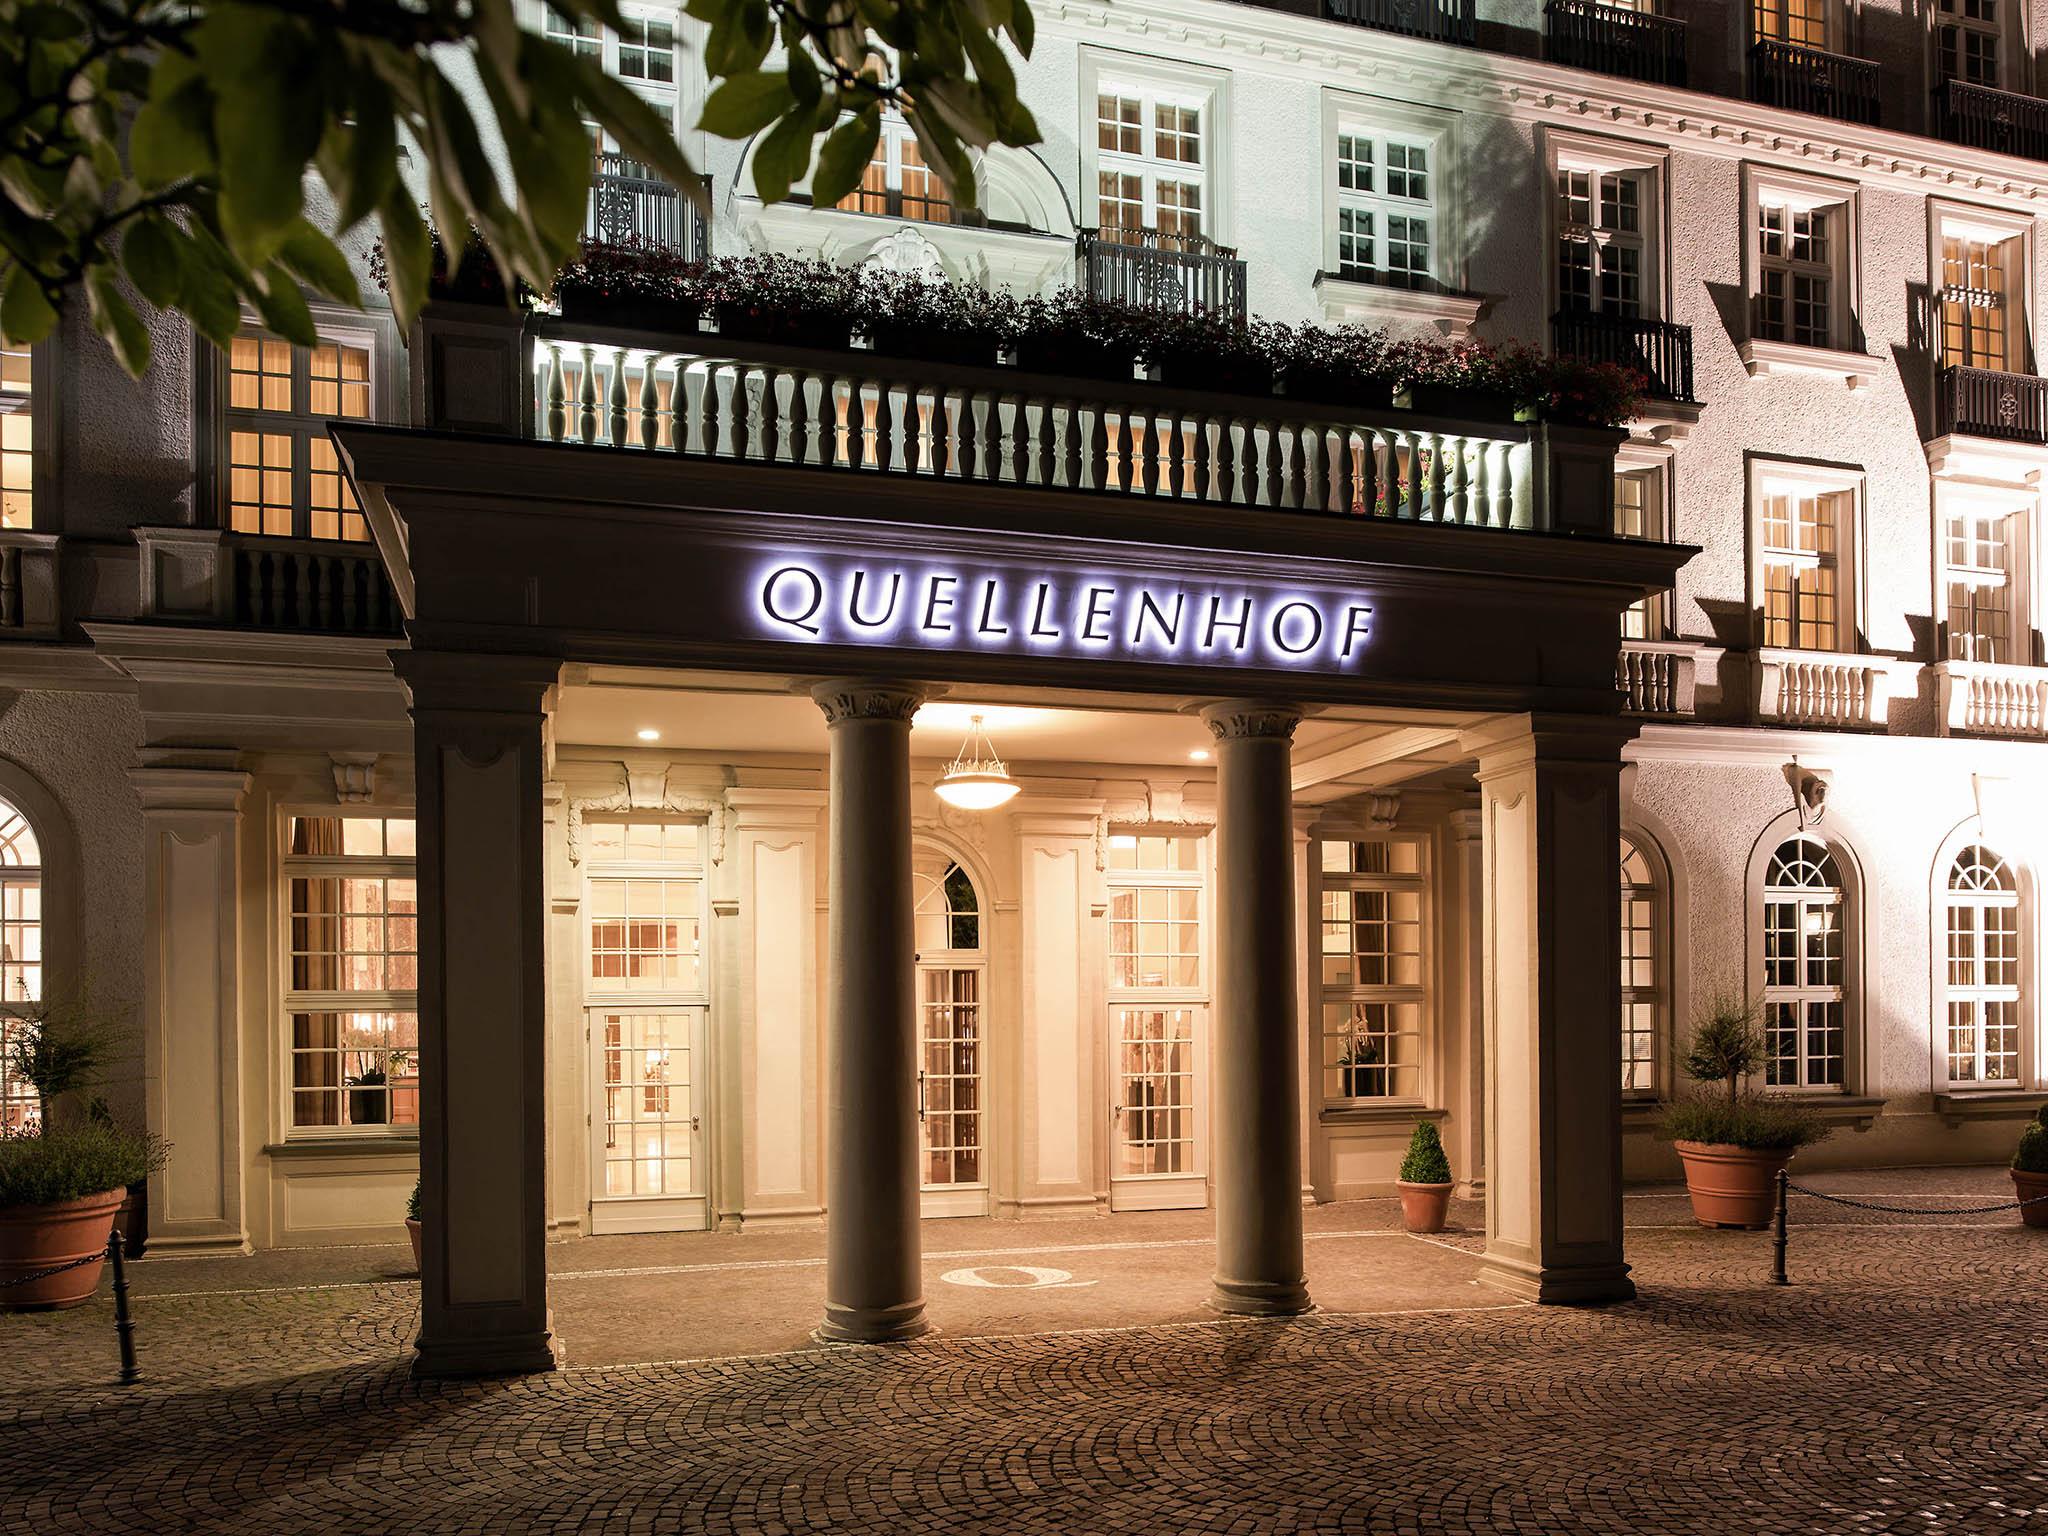 Hotel – Pullman Aachen Quellenhof